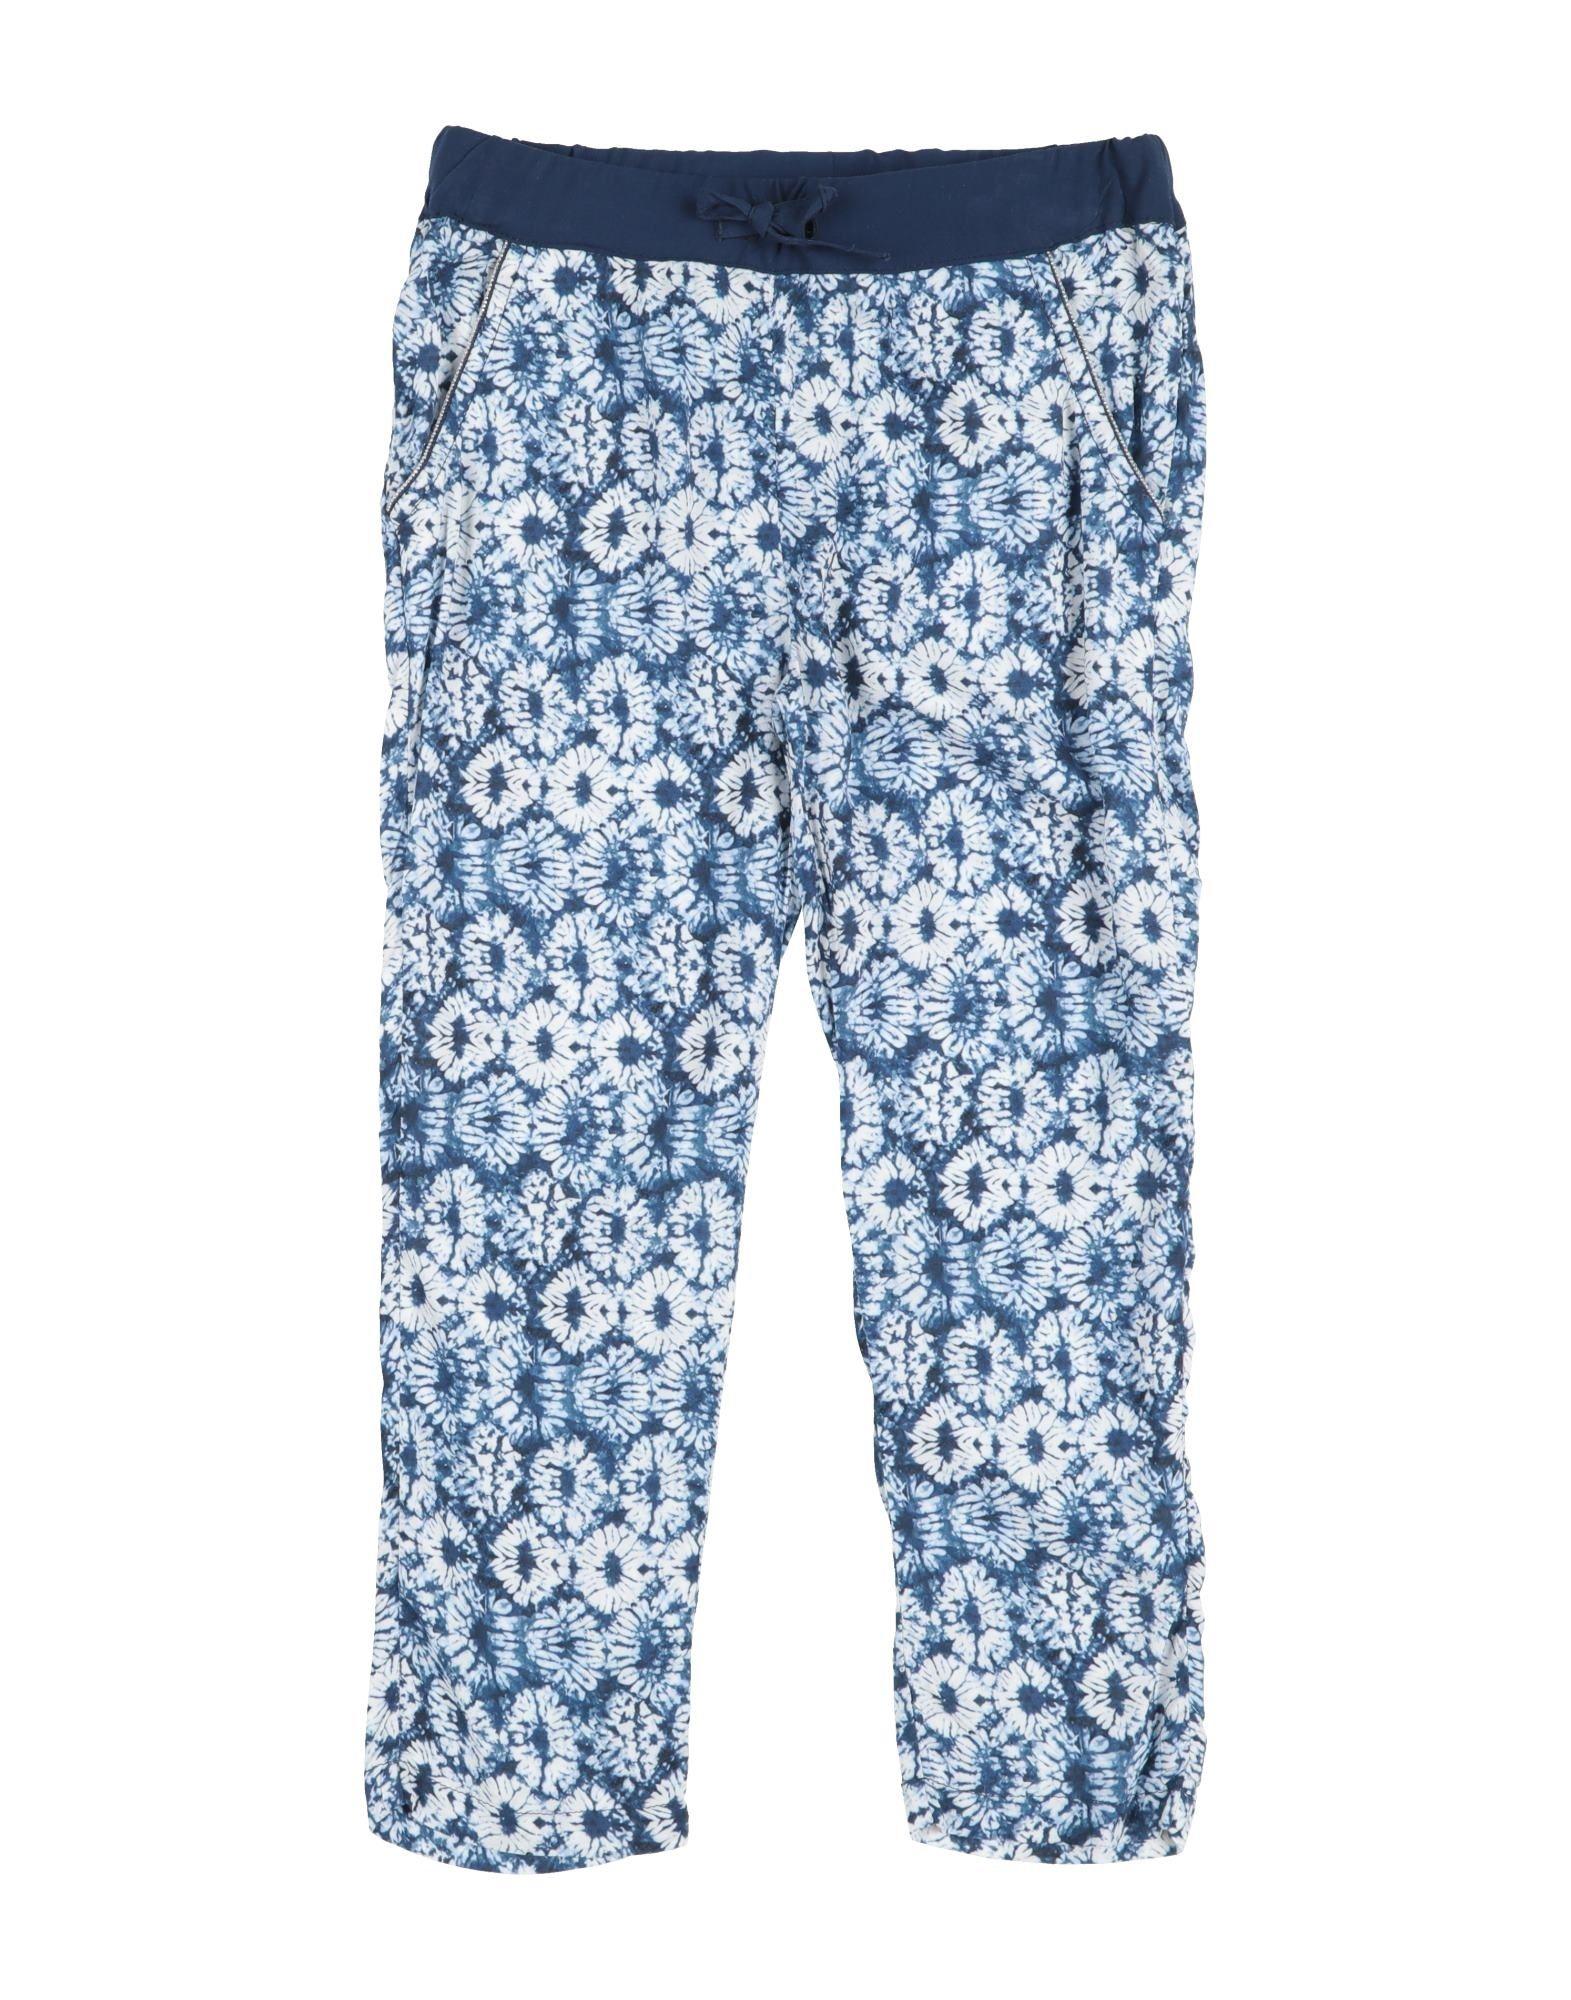 3 Pommes Kids' Casual Pants In Blue